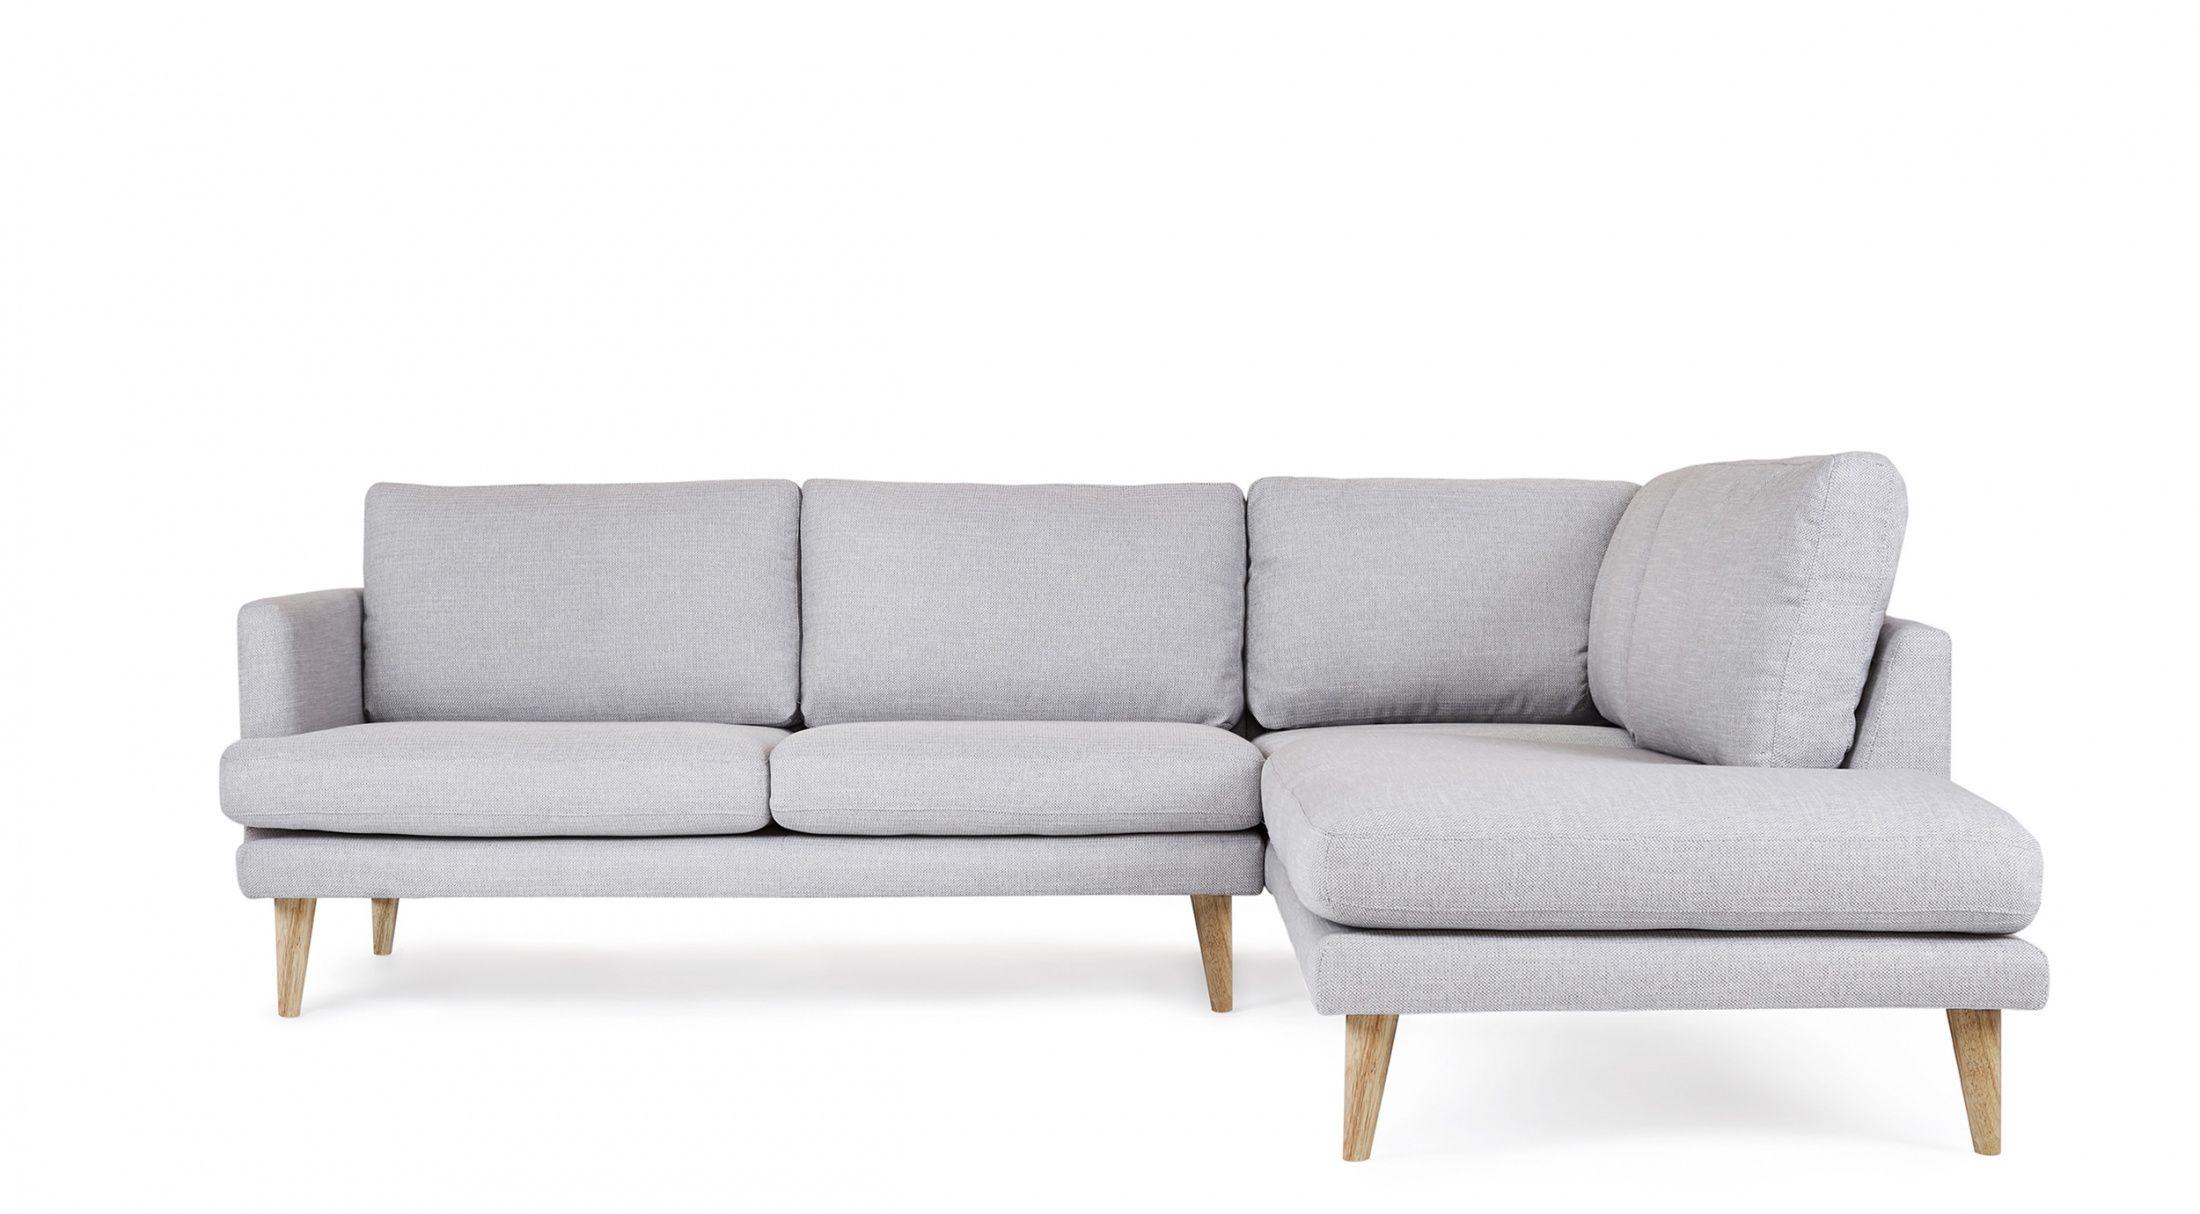 Hugo Corner Sofa 5 Seater Sofa Scandinavian Design Wooden Legs Light Grey Fa93wo6t Scandinavian Sofas Sofa Sofa Images